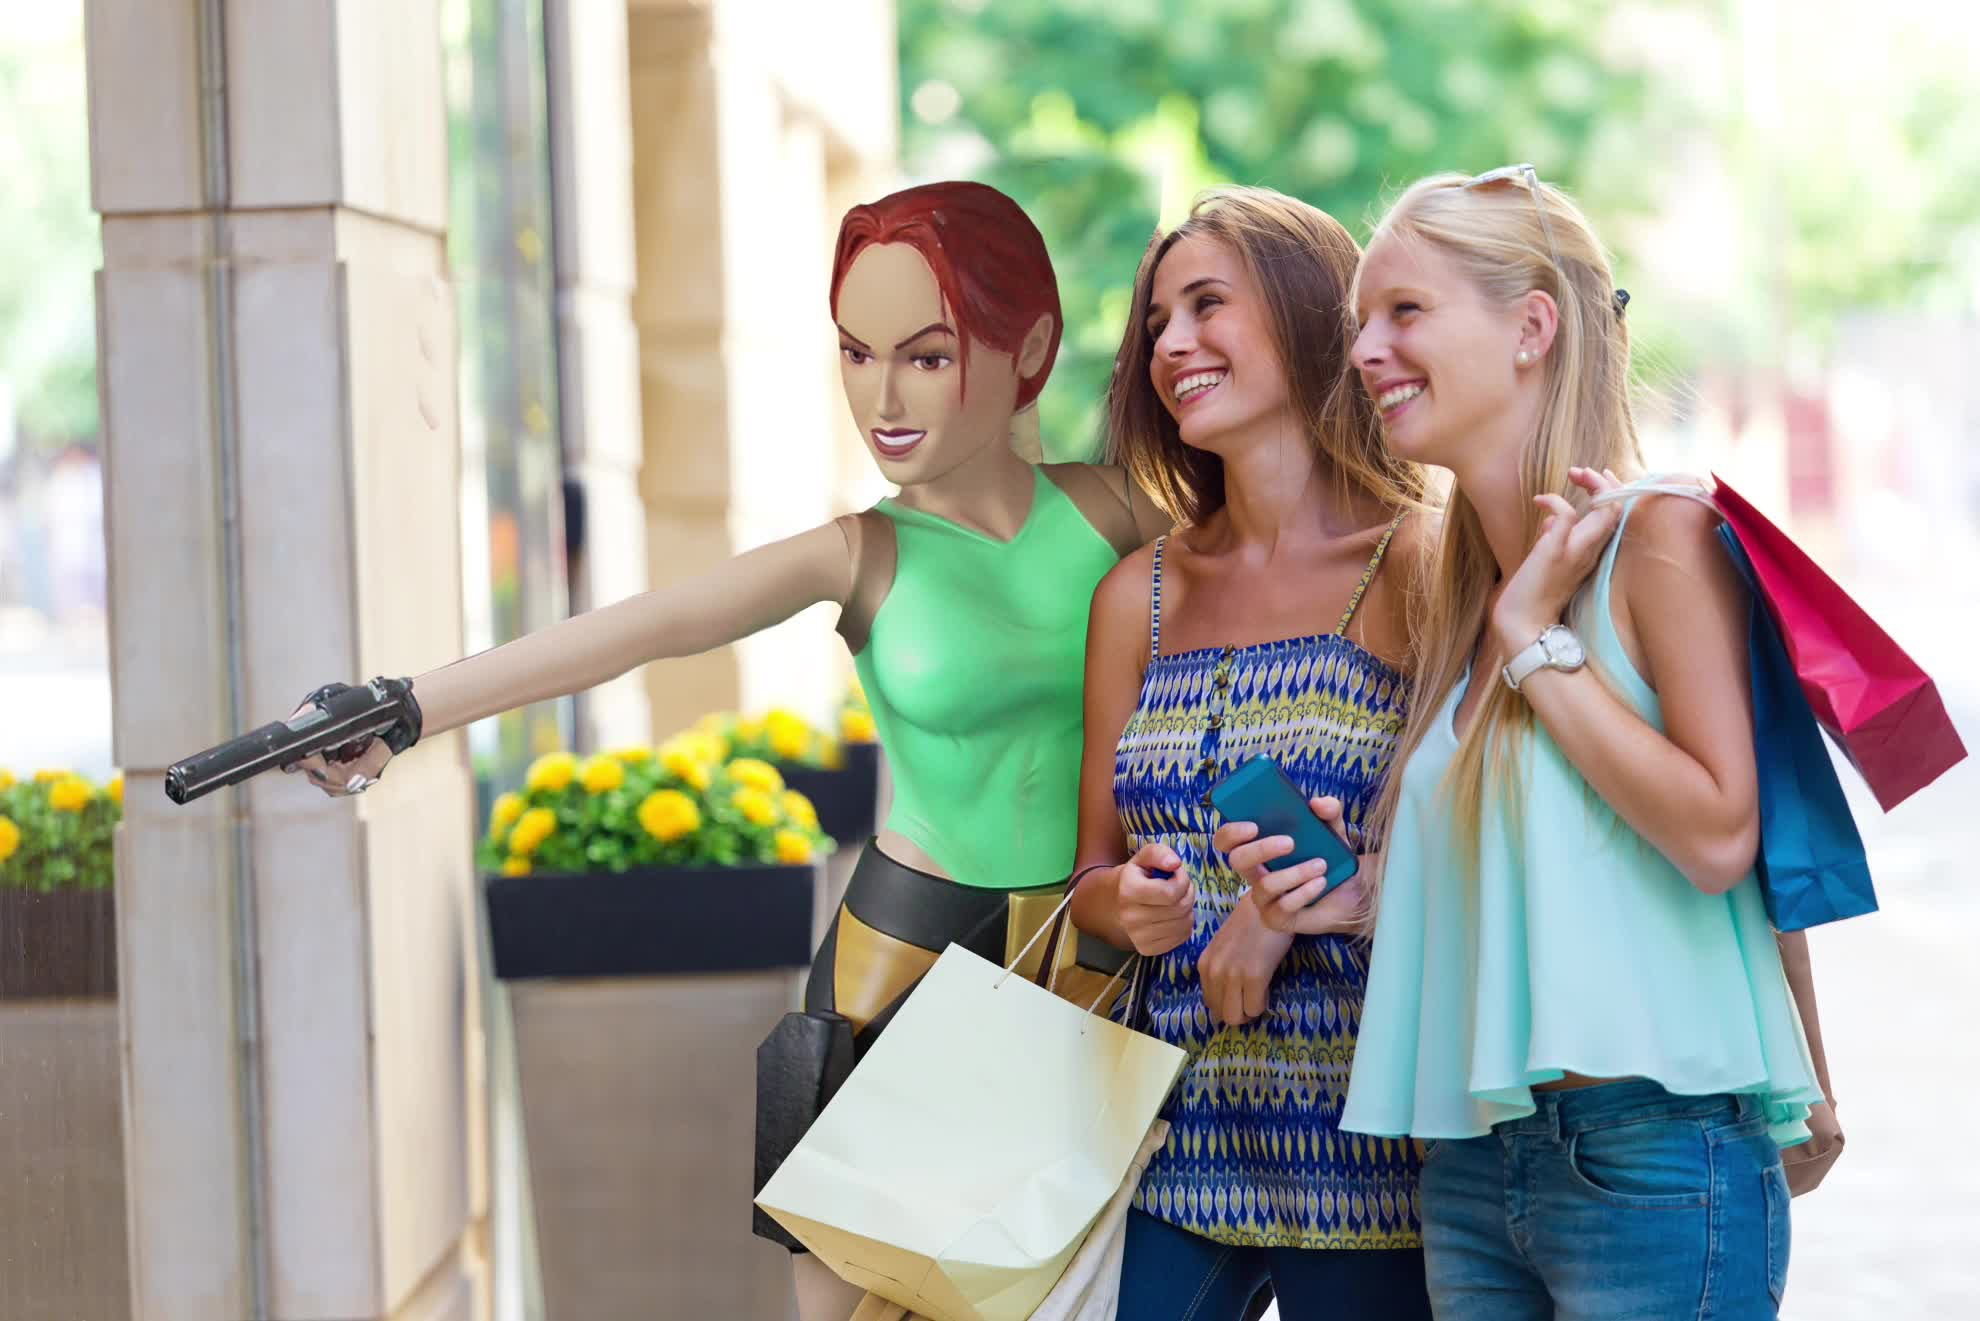 photoshopbattles, Shopping.ng GIFs